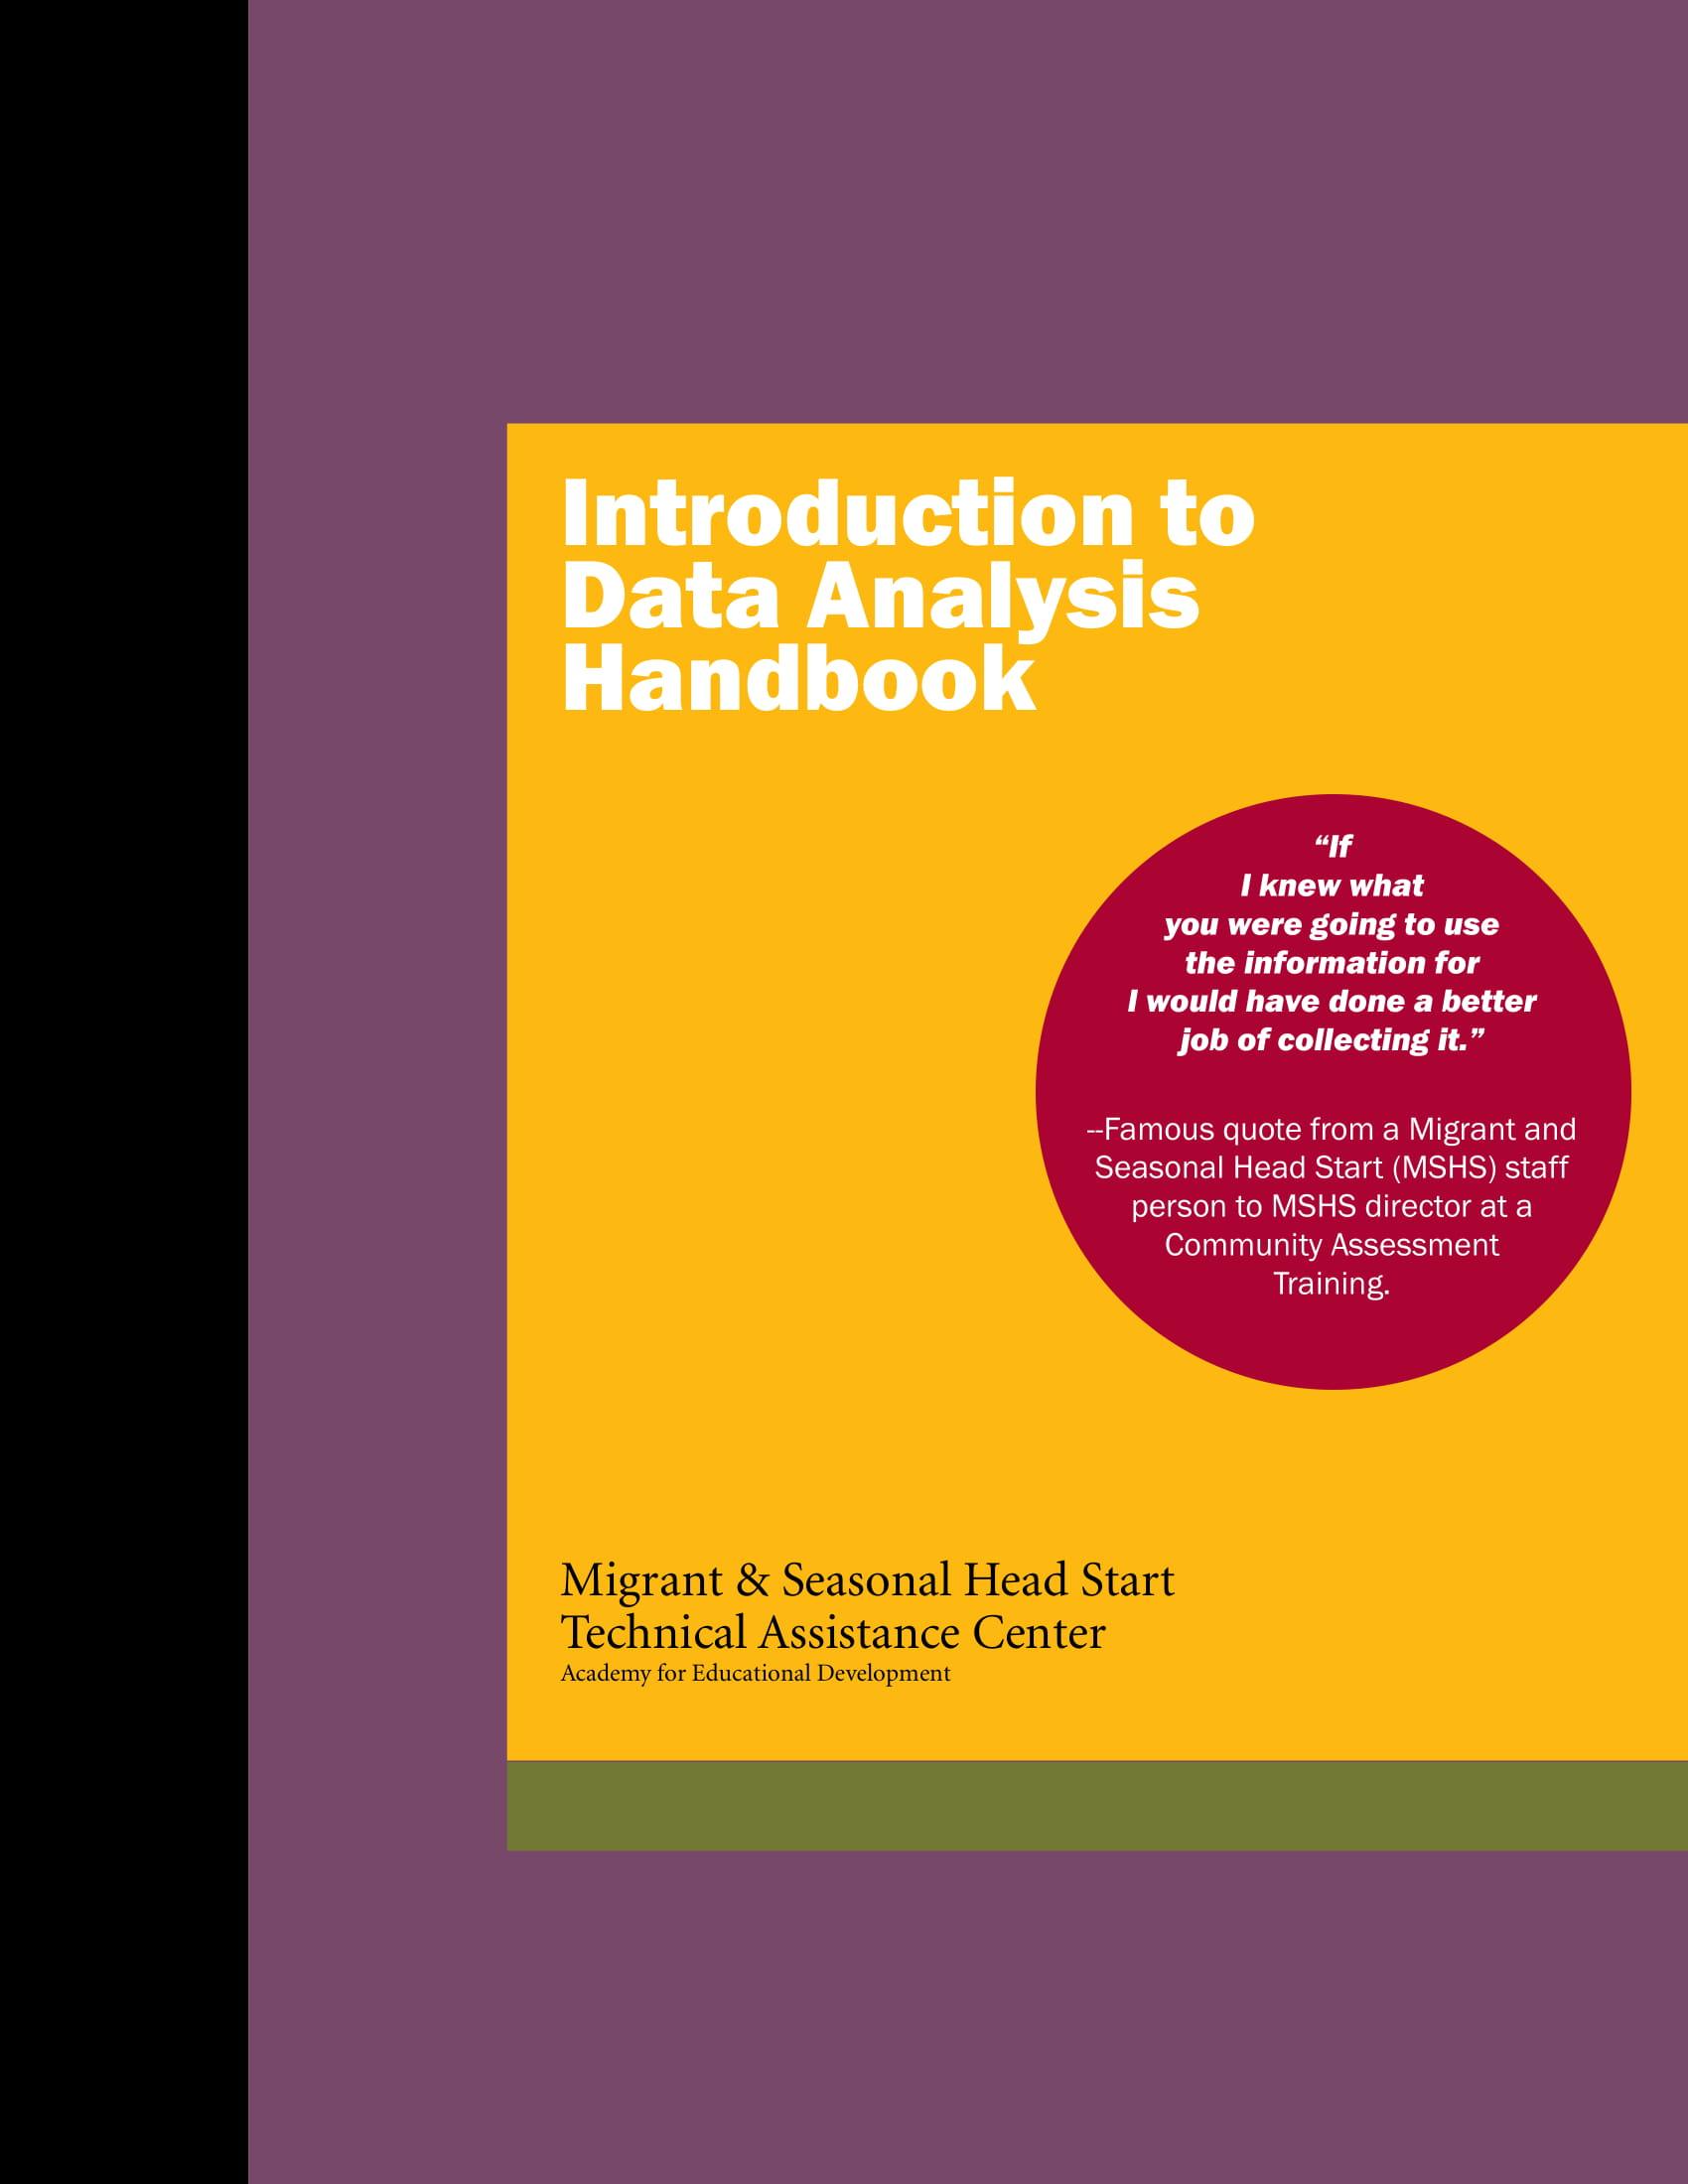 data analysis report handbook and guide example 001